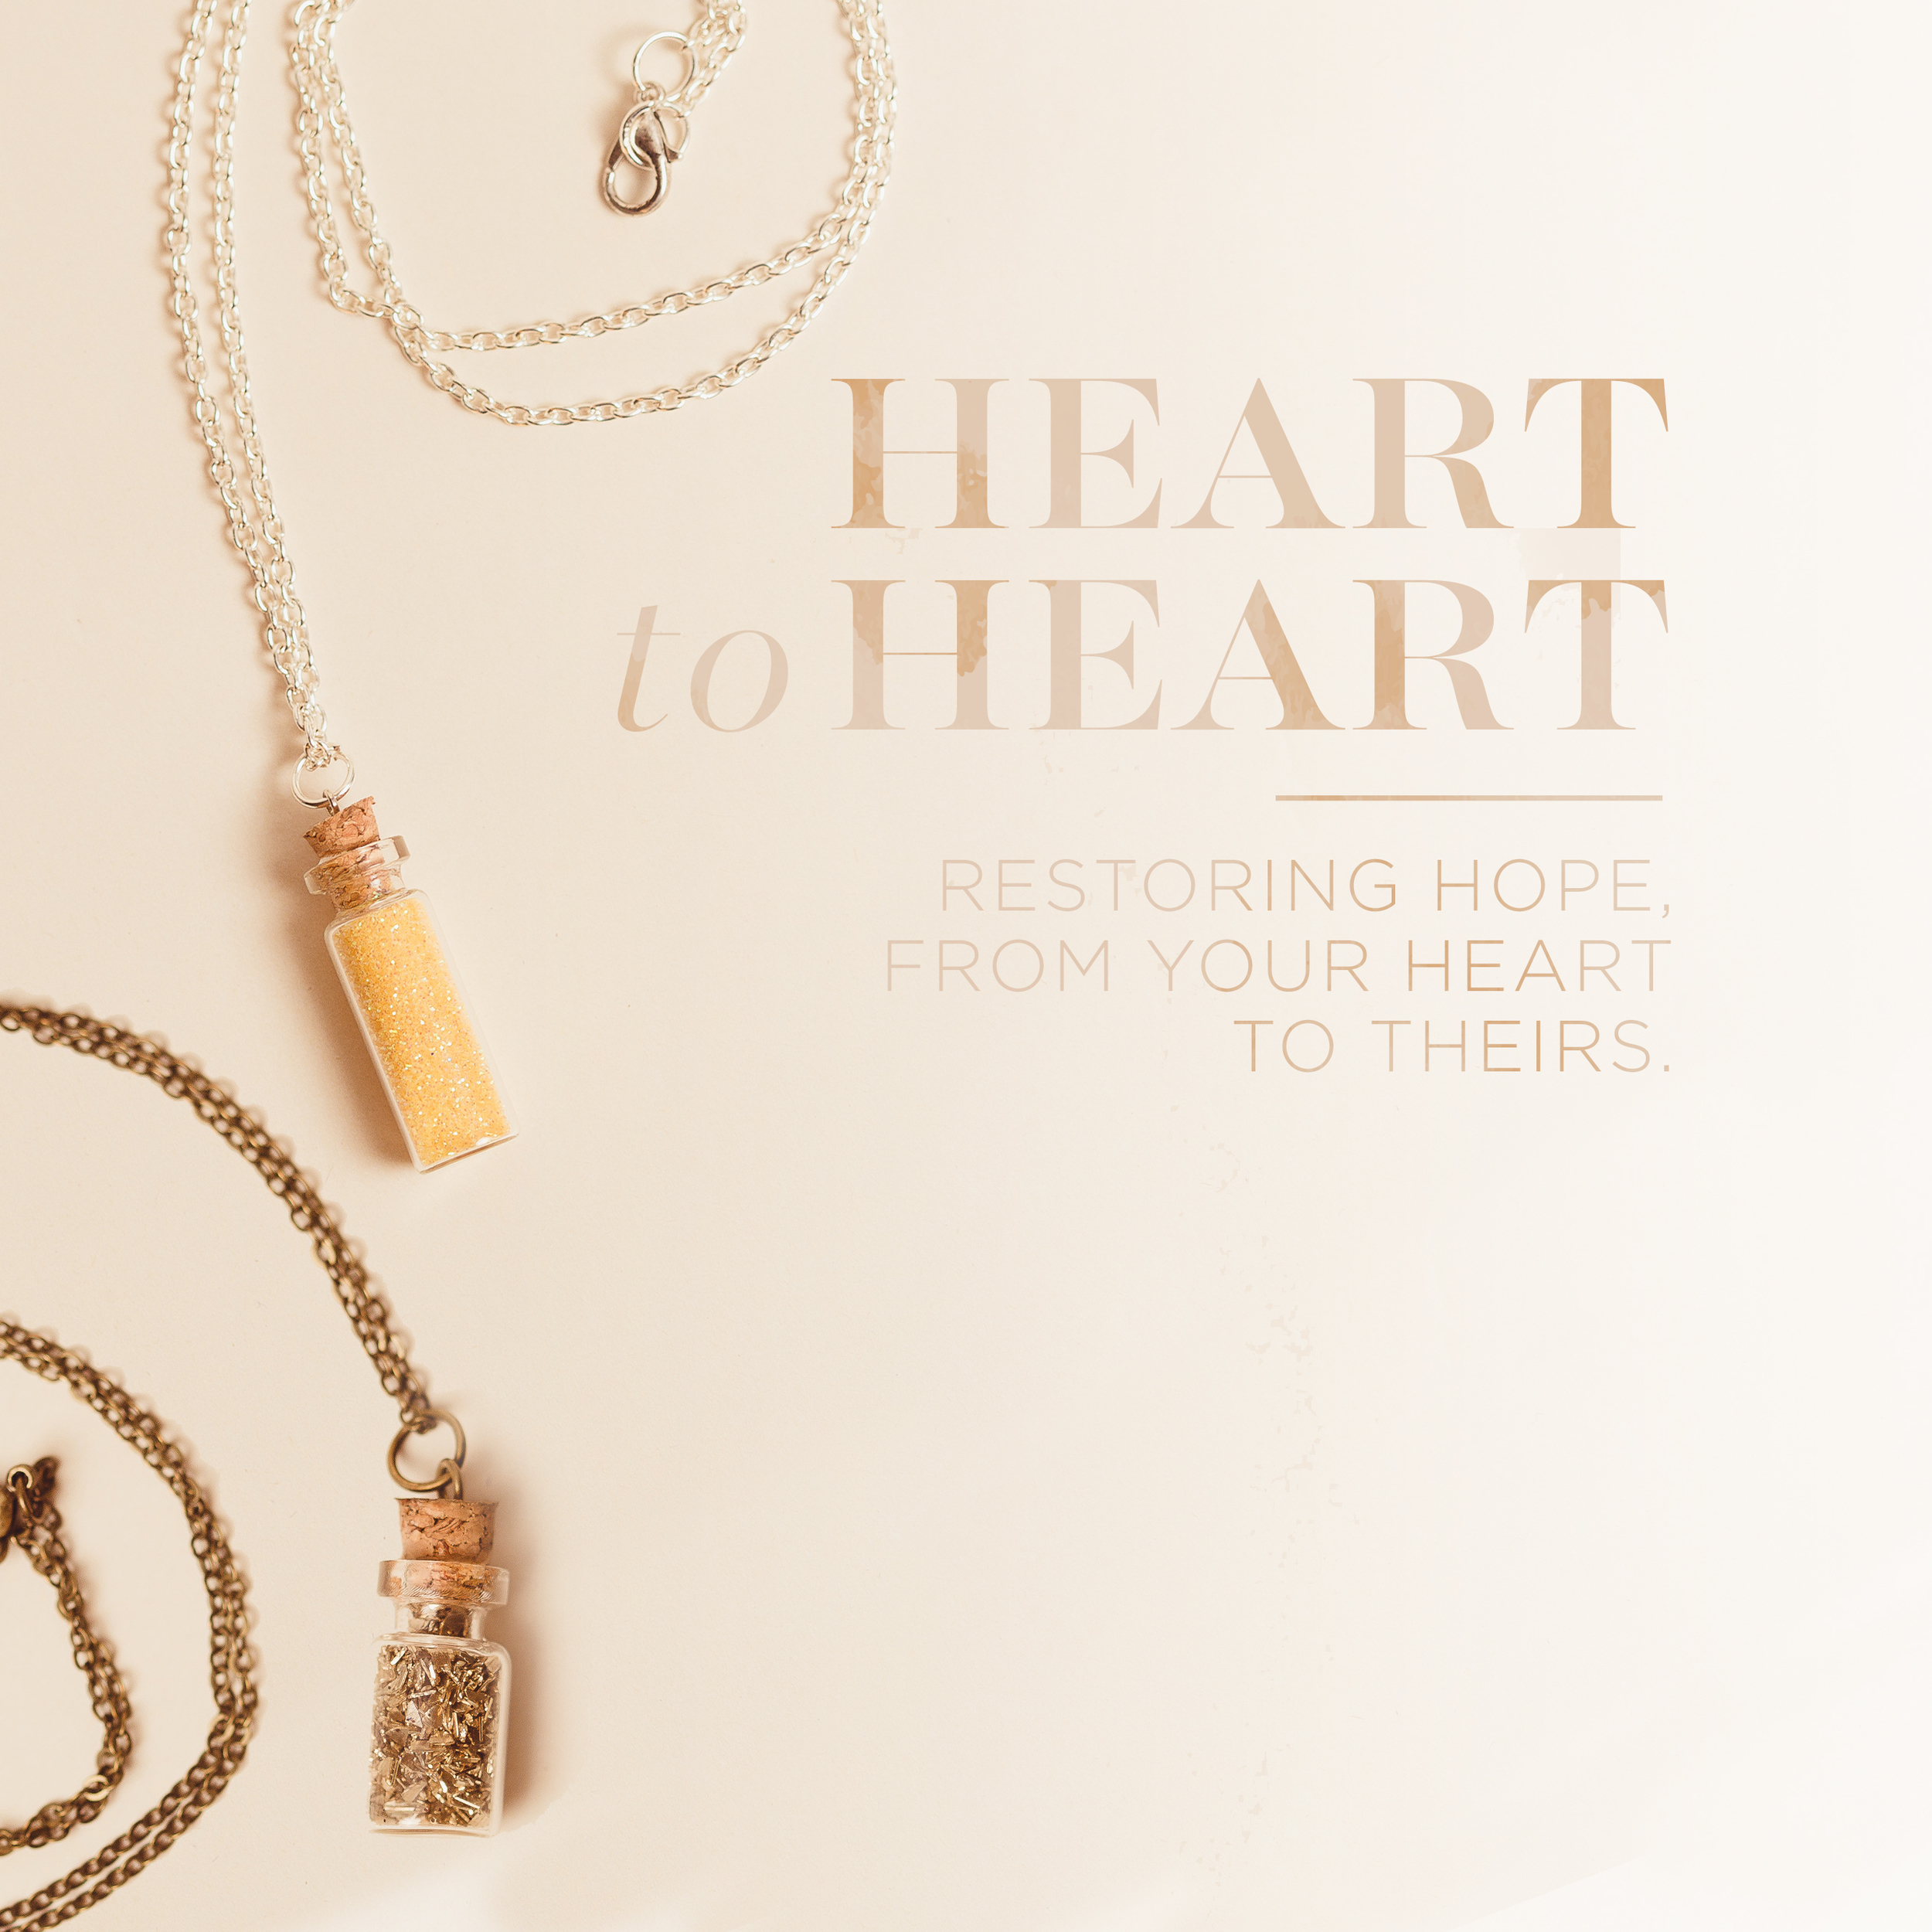 hearttoheart5 (2).jpg